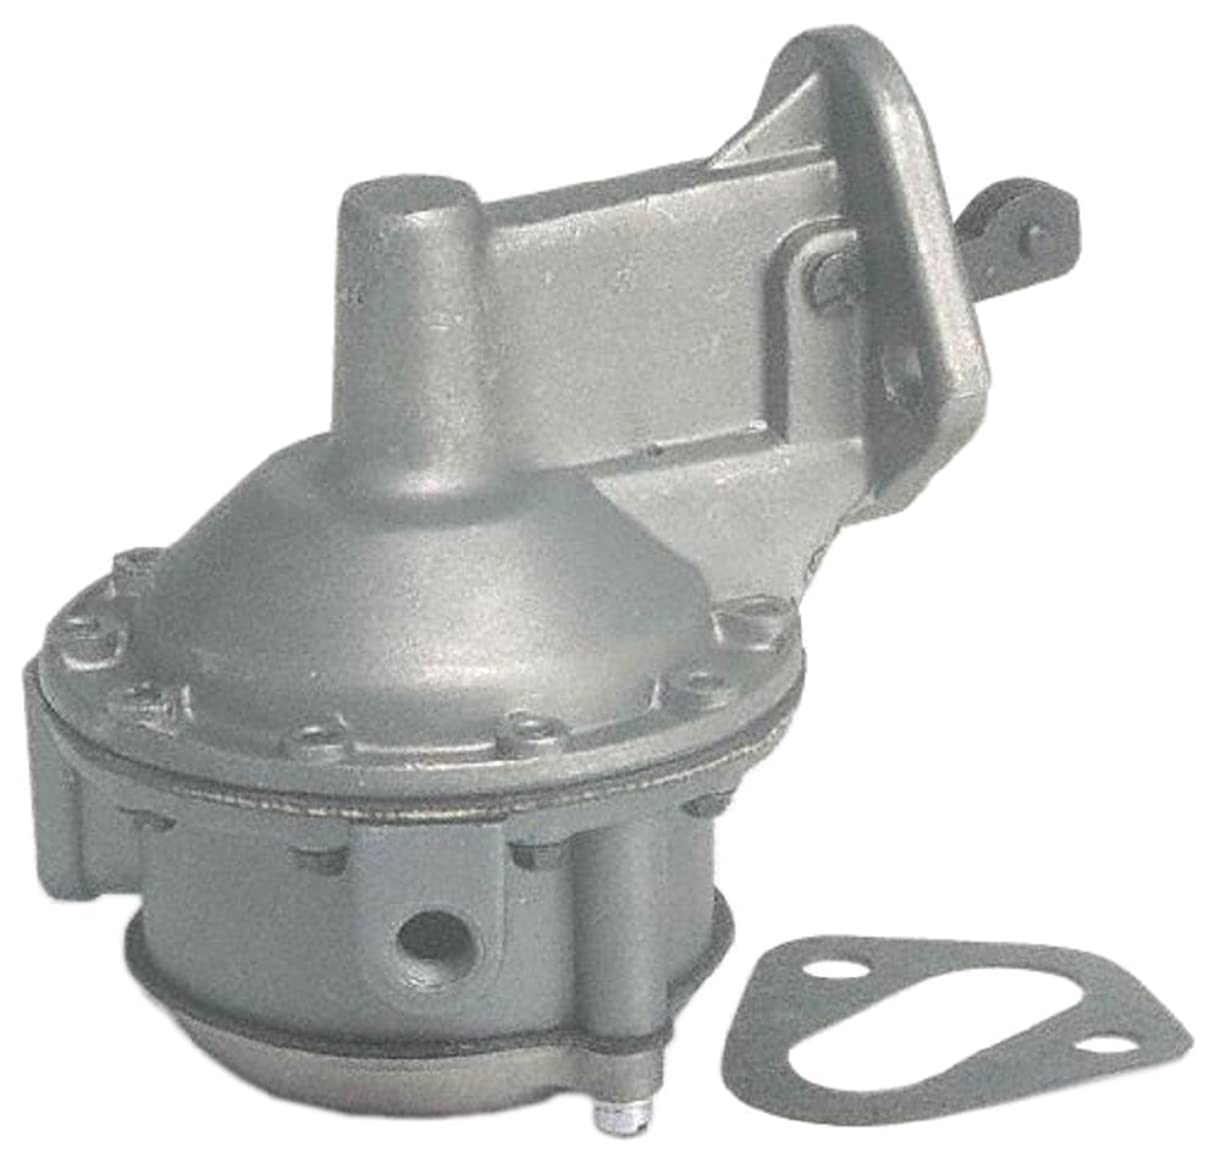 Carter M3019 Mechanical Fuel Pump uctxl5184